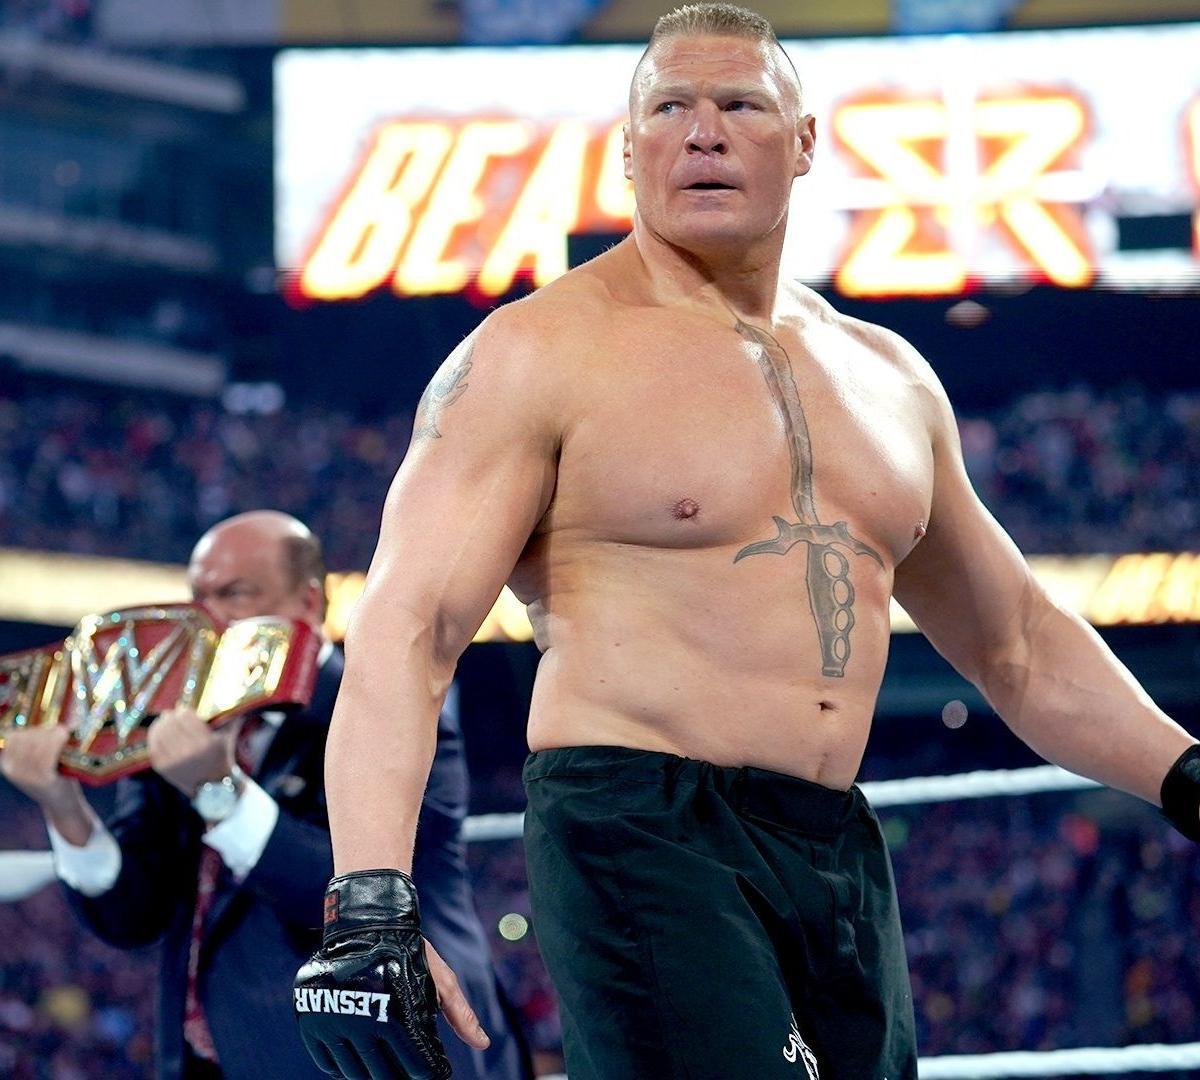 Backstage WWE Rumors: Latest on Brock Lesnar, The Revival